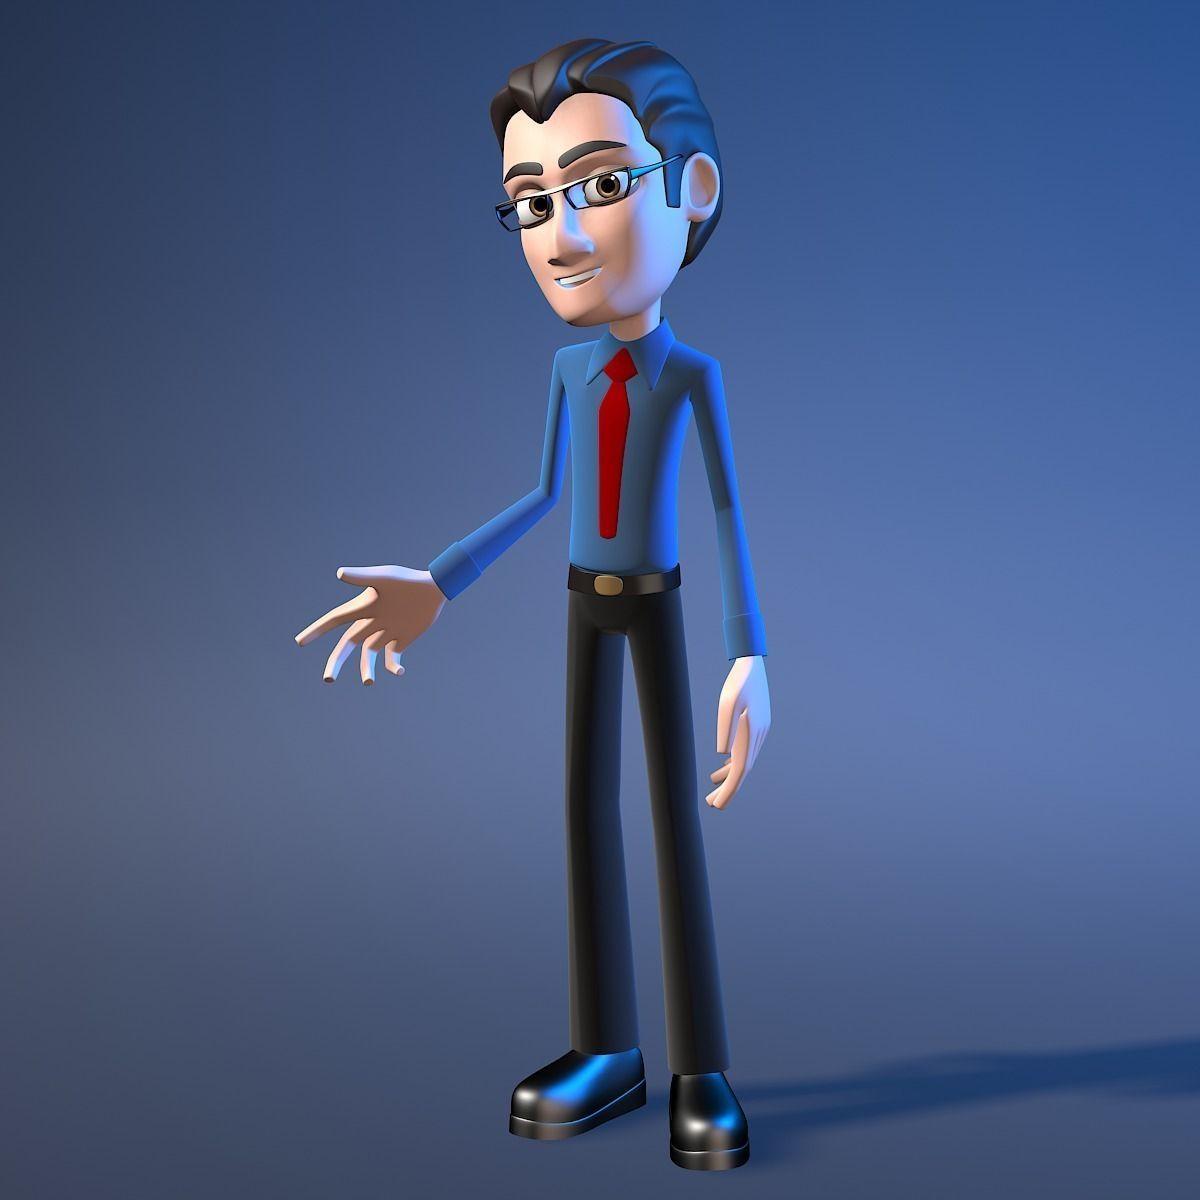 Cartoon Office Character Man 3d Model Rigged Max Obj Fbx